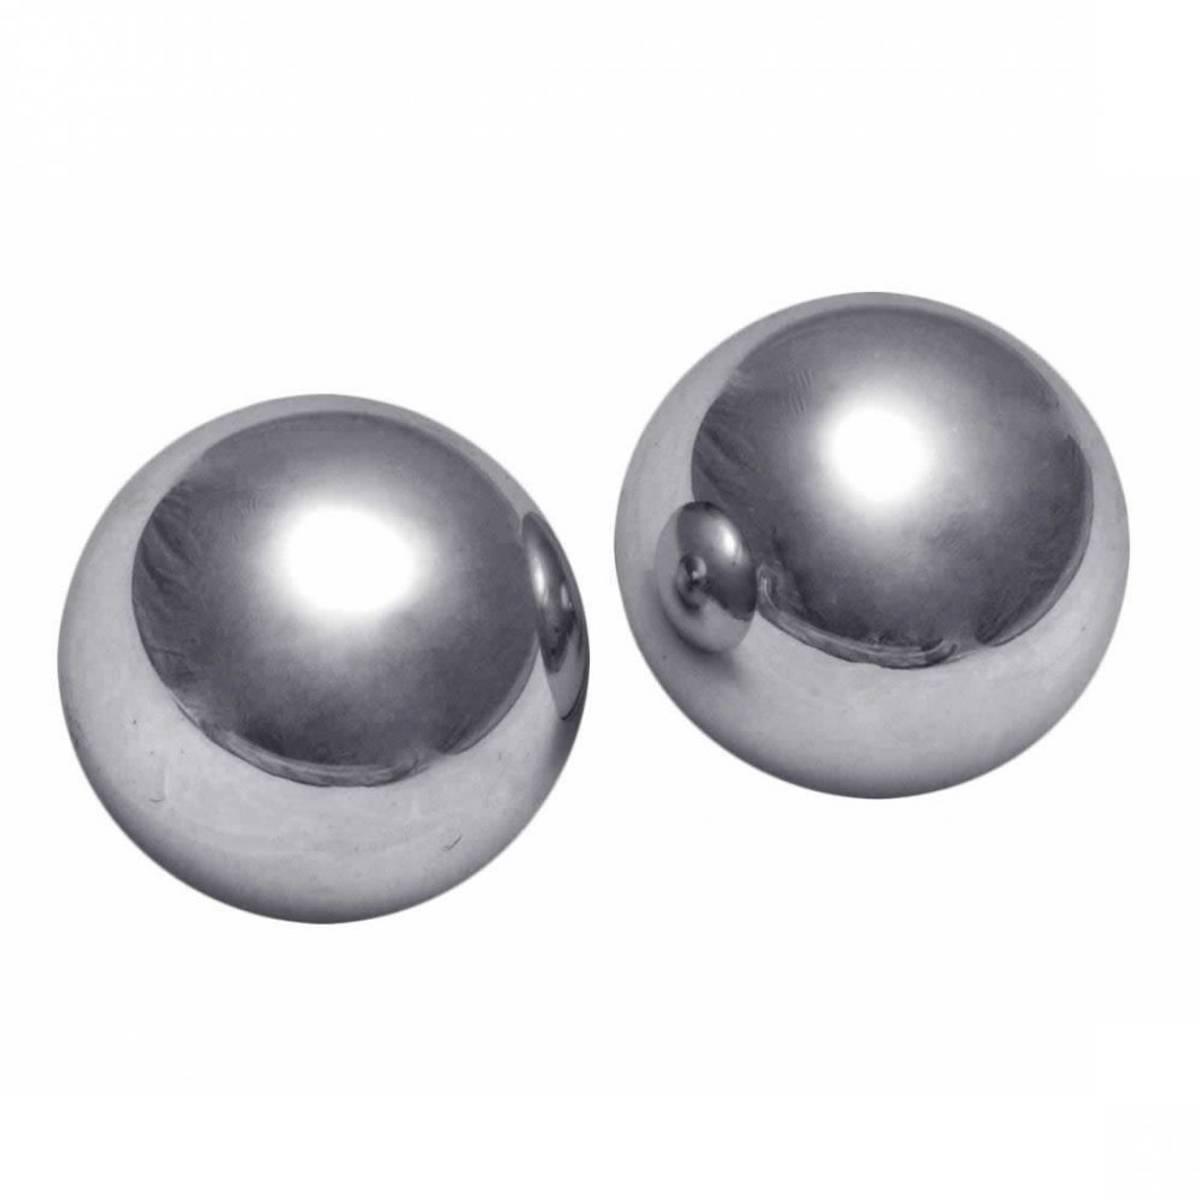 Master Series - Titanica Extreme Steel Orgasm Balls